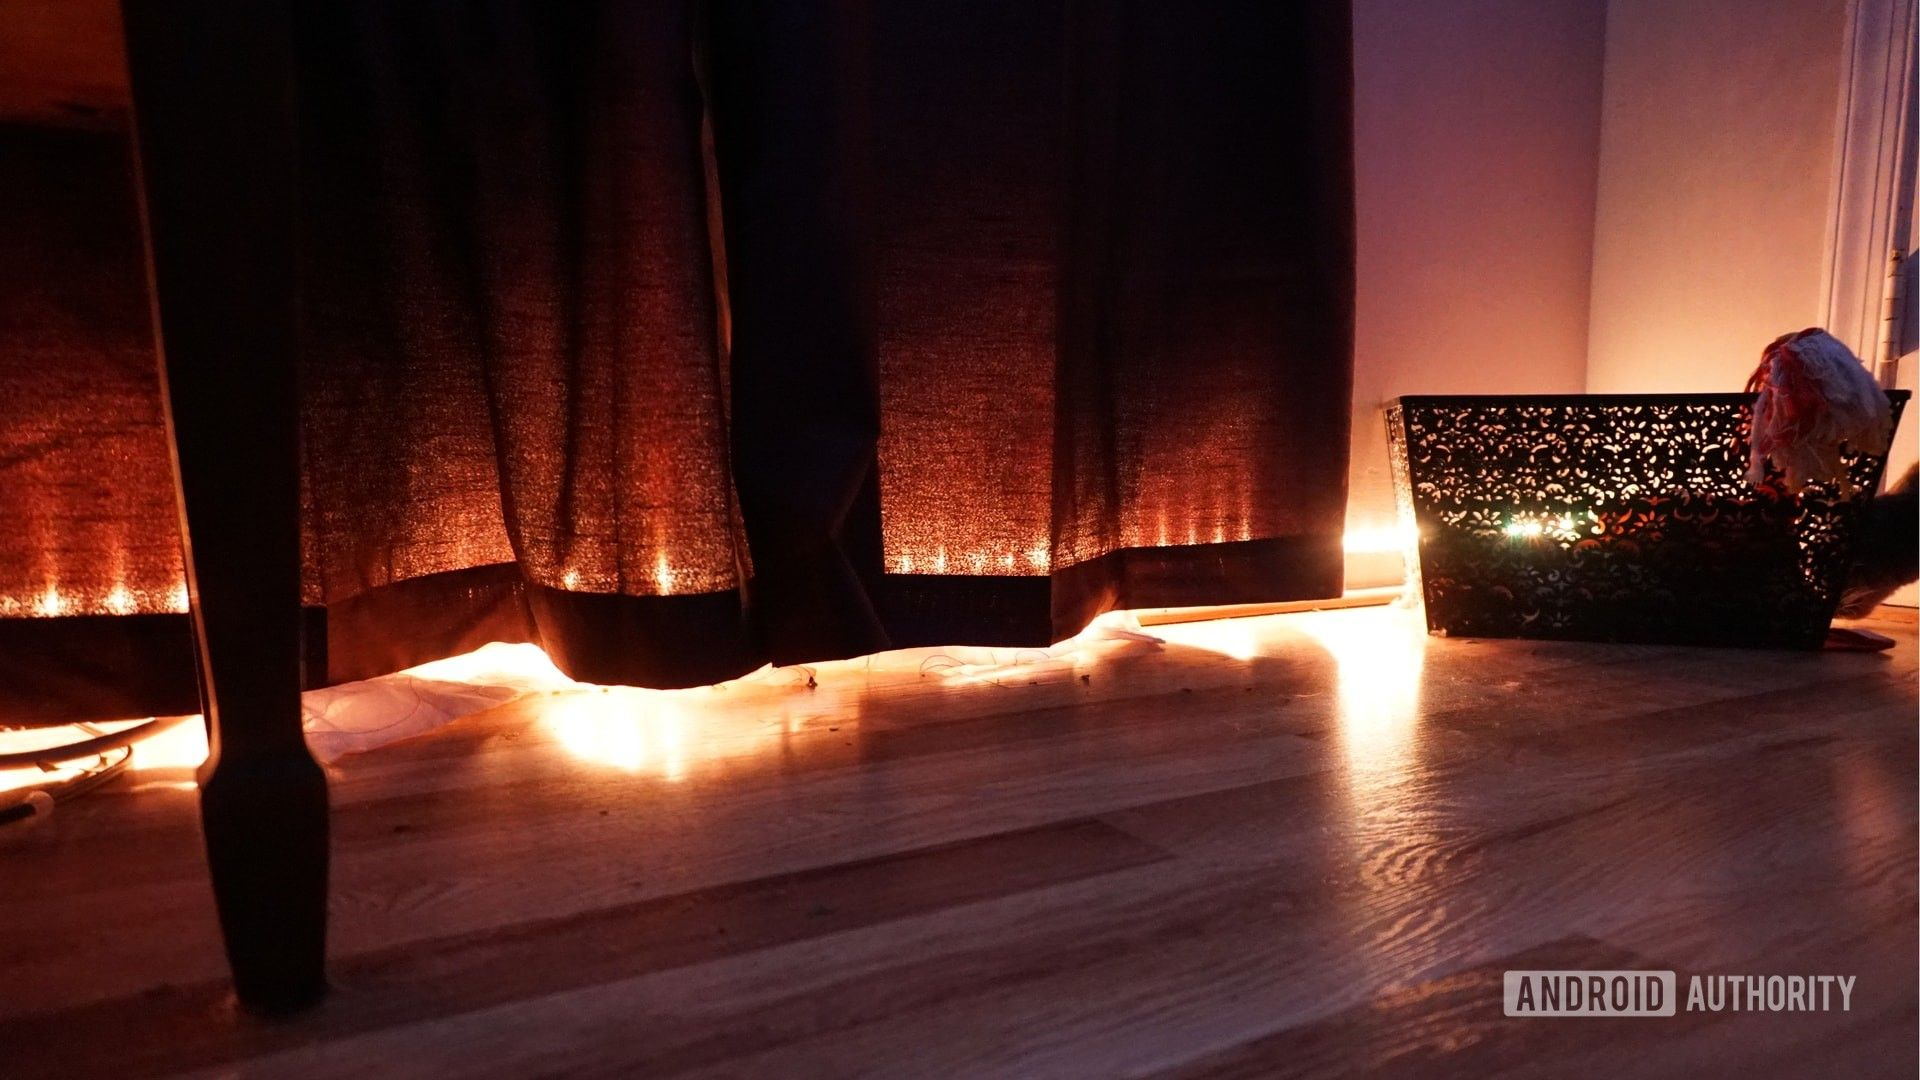 Installing Govee Led Strip Lights On Ceiling Strip Lighting Cool House Designs Led Strip Lighting